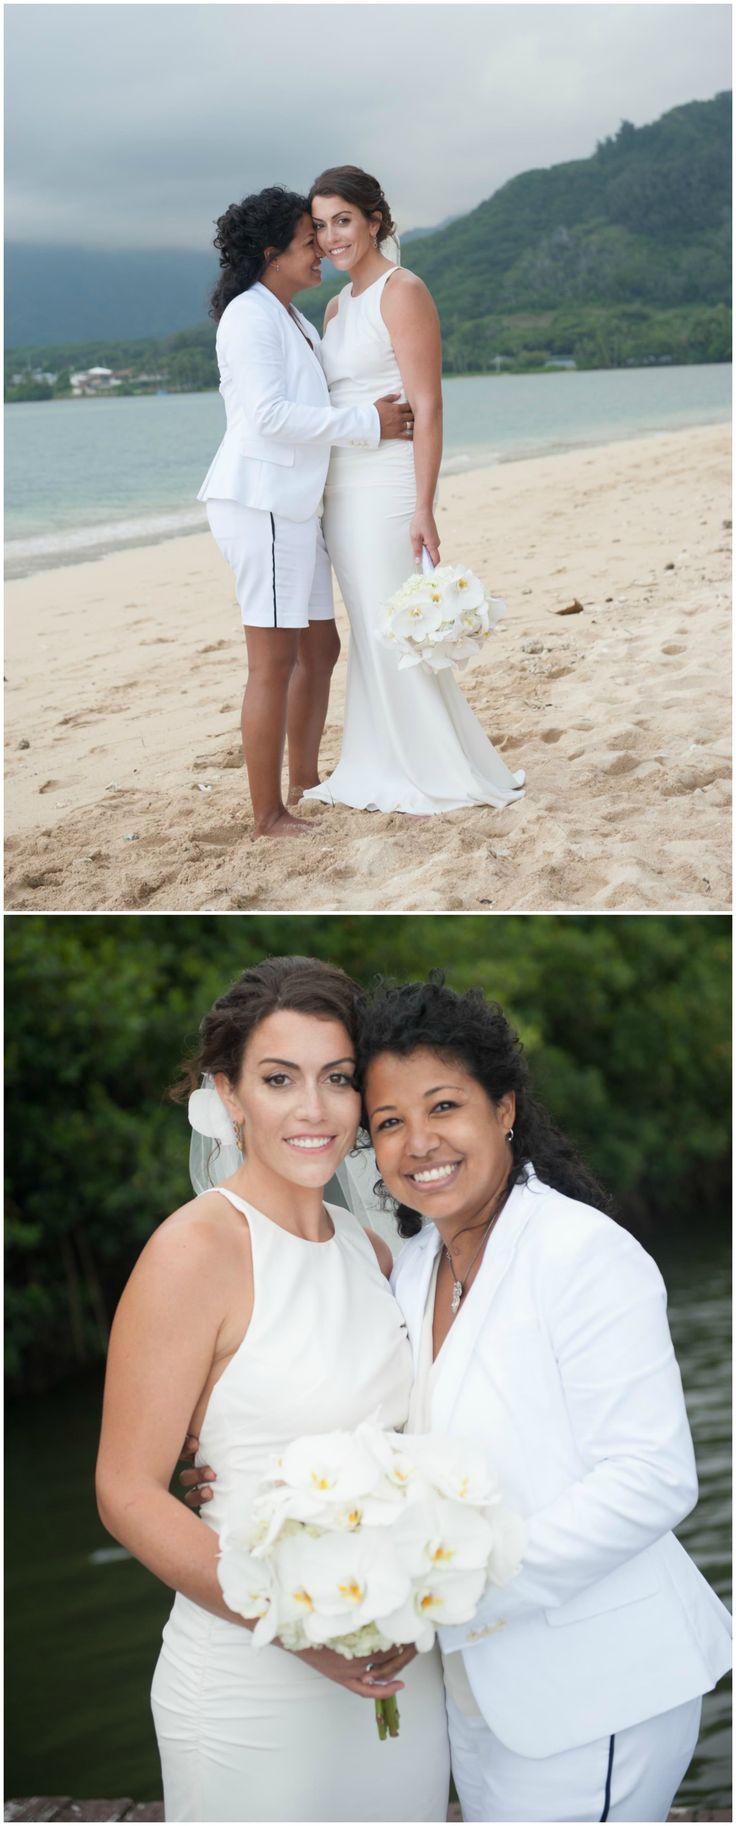 Beach Wedding Fashion Hawaii Bouquet Of White Orchids Modern Dress